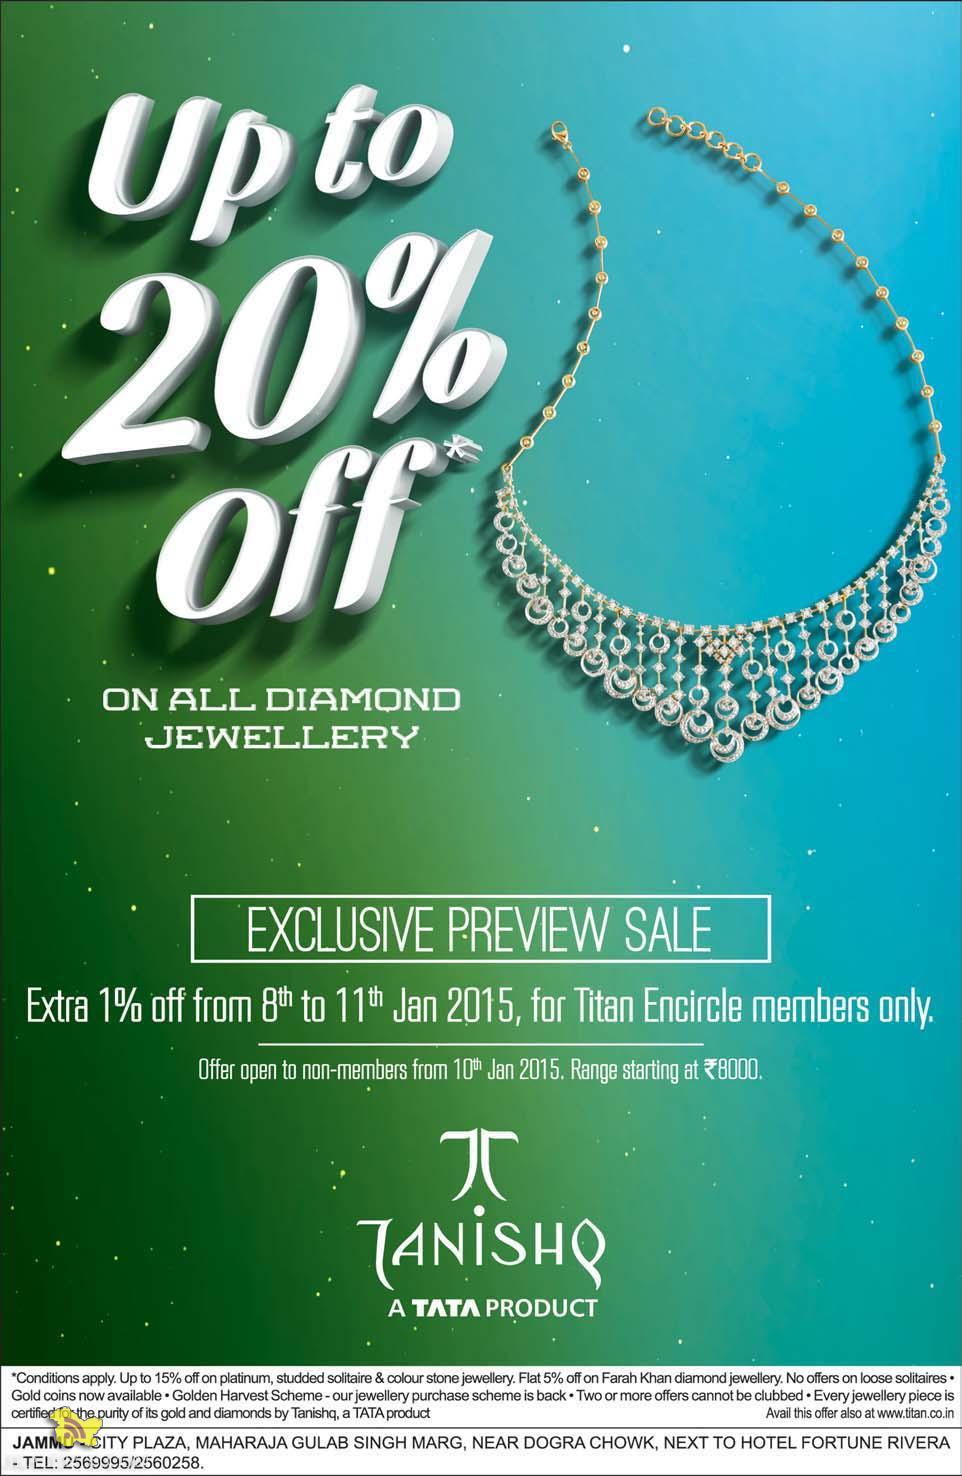 Upto 20% off on Diamond Jewellery, Exculsive preview sale